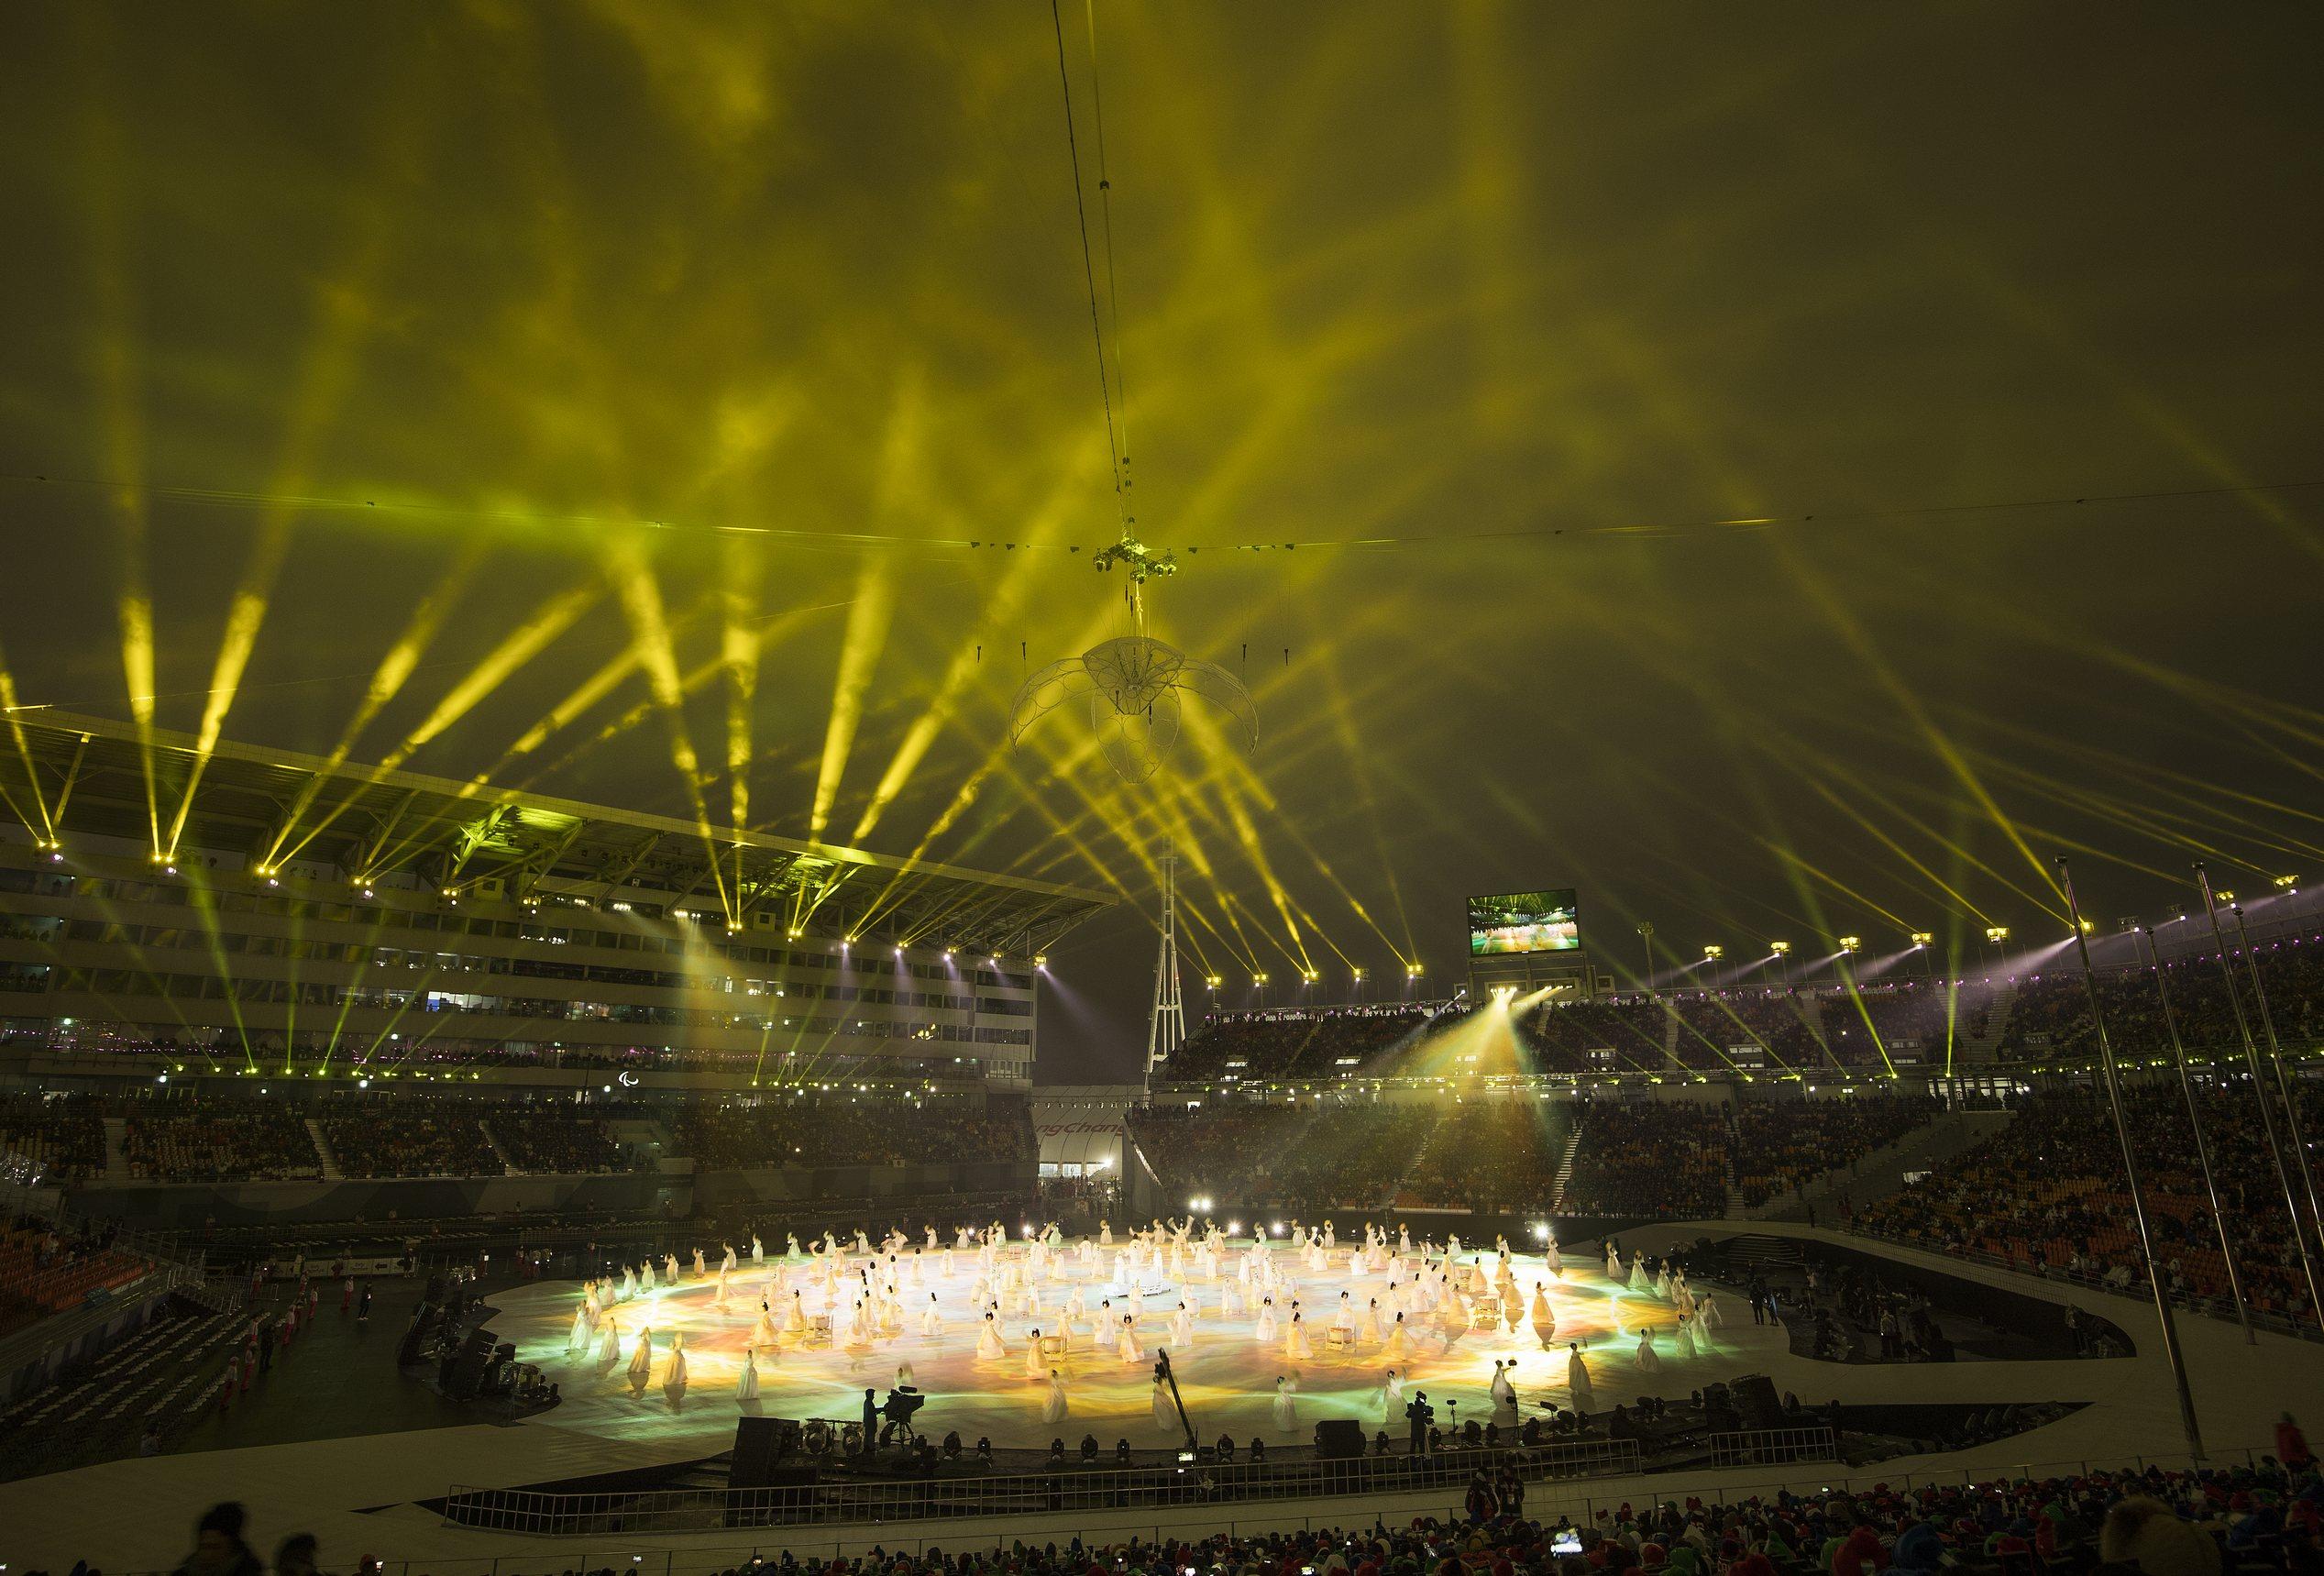 Inaguracion Paralimpiada Pyeongchang 2018 019